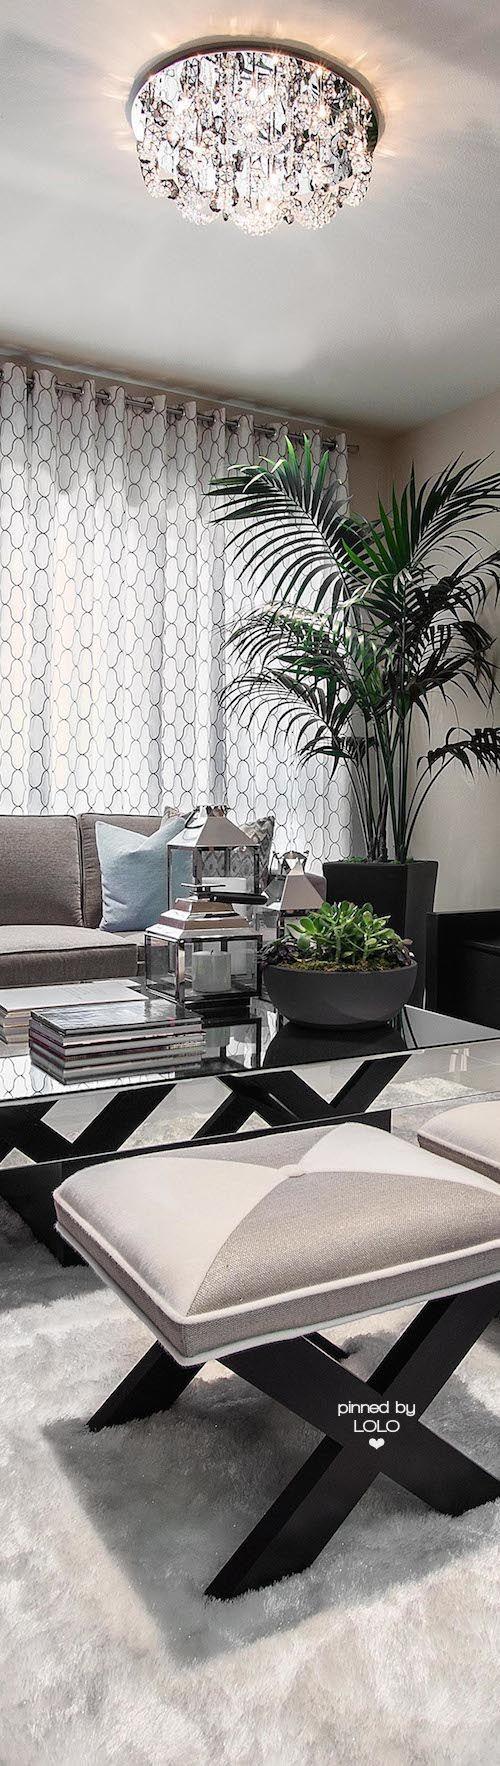 Orange Coast Interior Design | LOLO❤︎